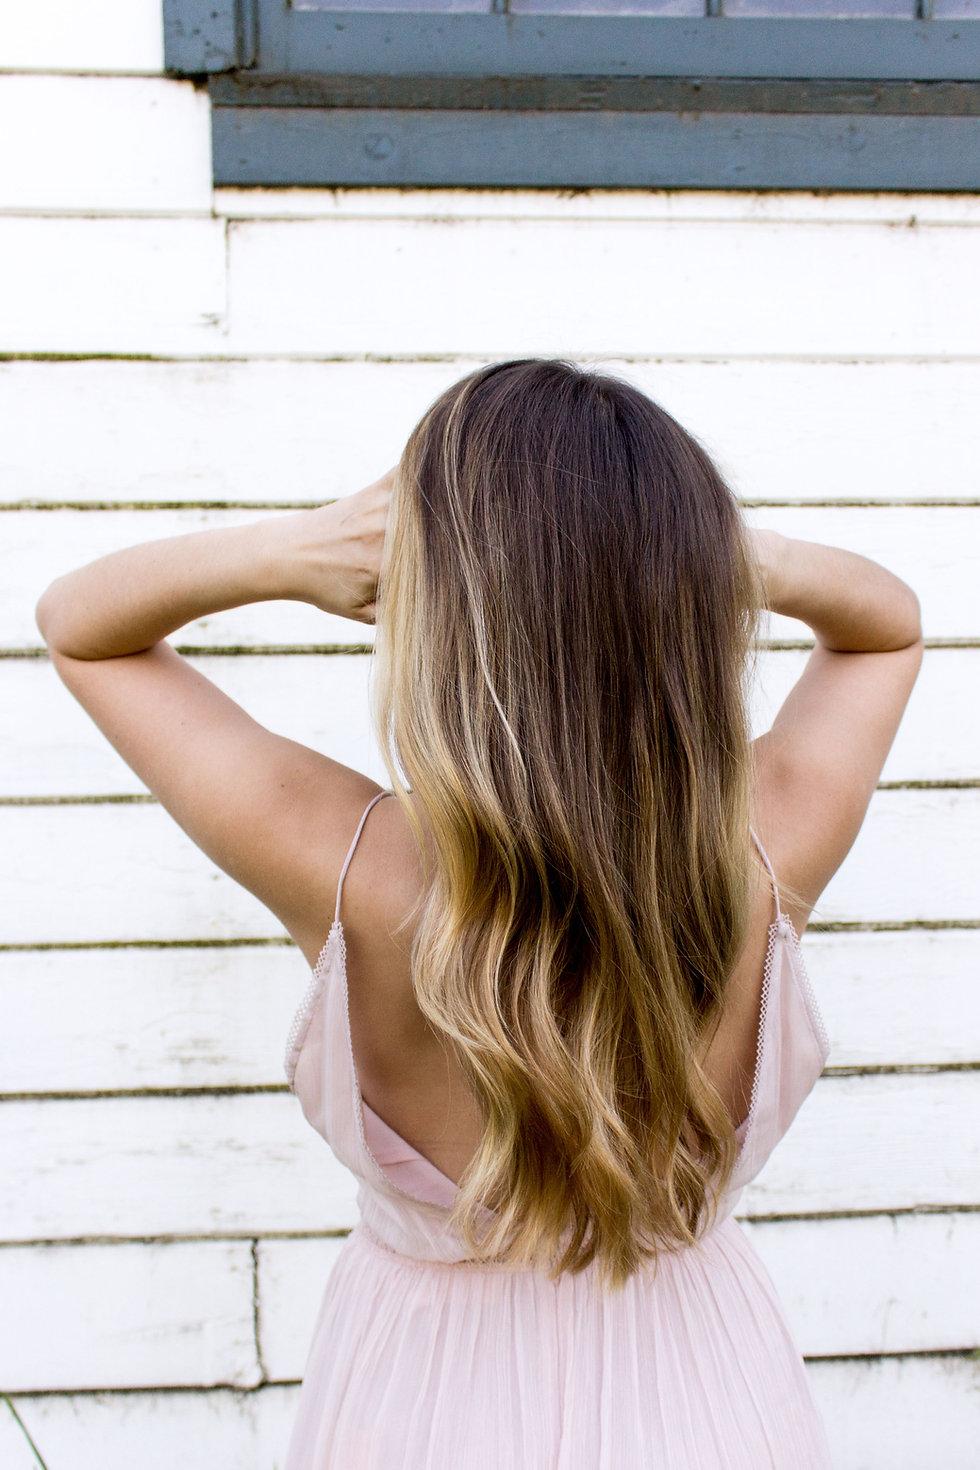 Image of woman with hair hi-lights for Salon Envy, hair salon in Highland Park, NJ, near New Brunswick.